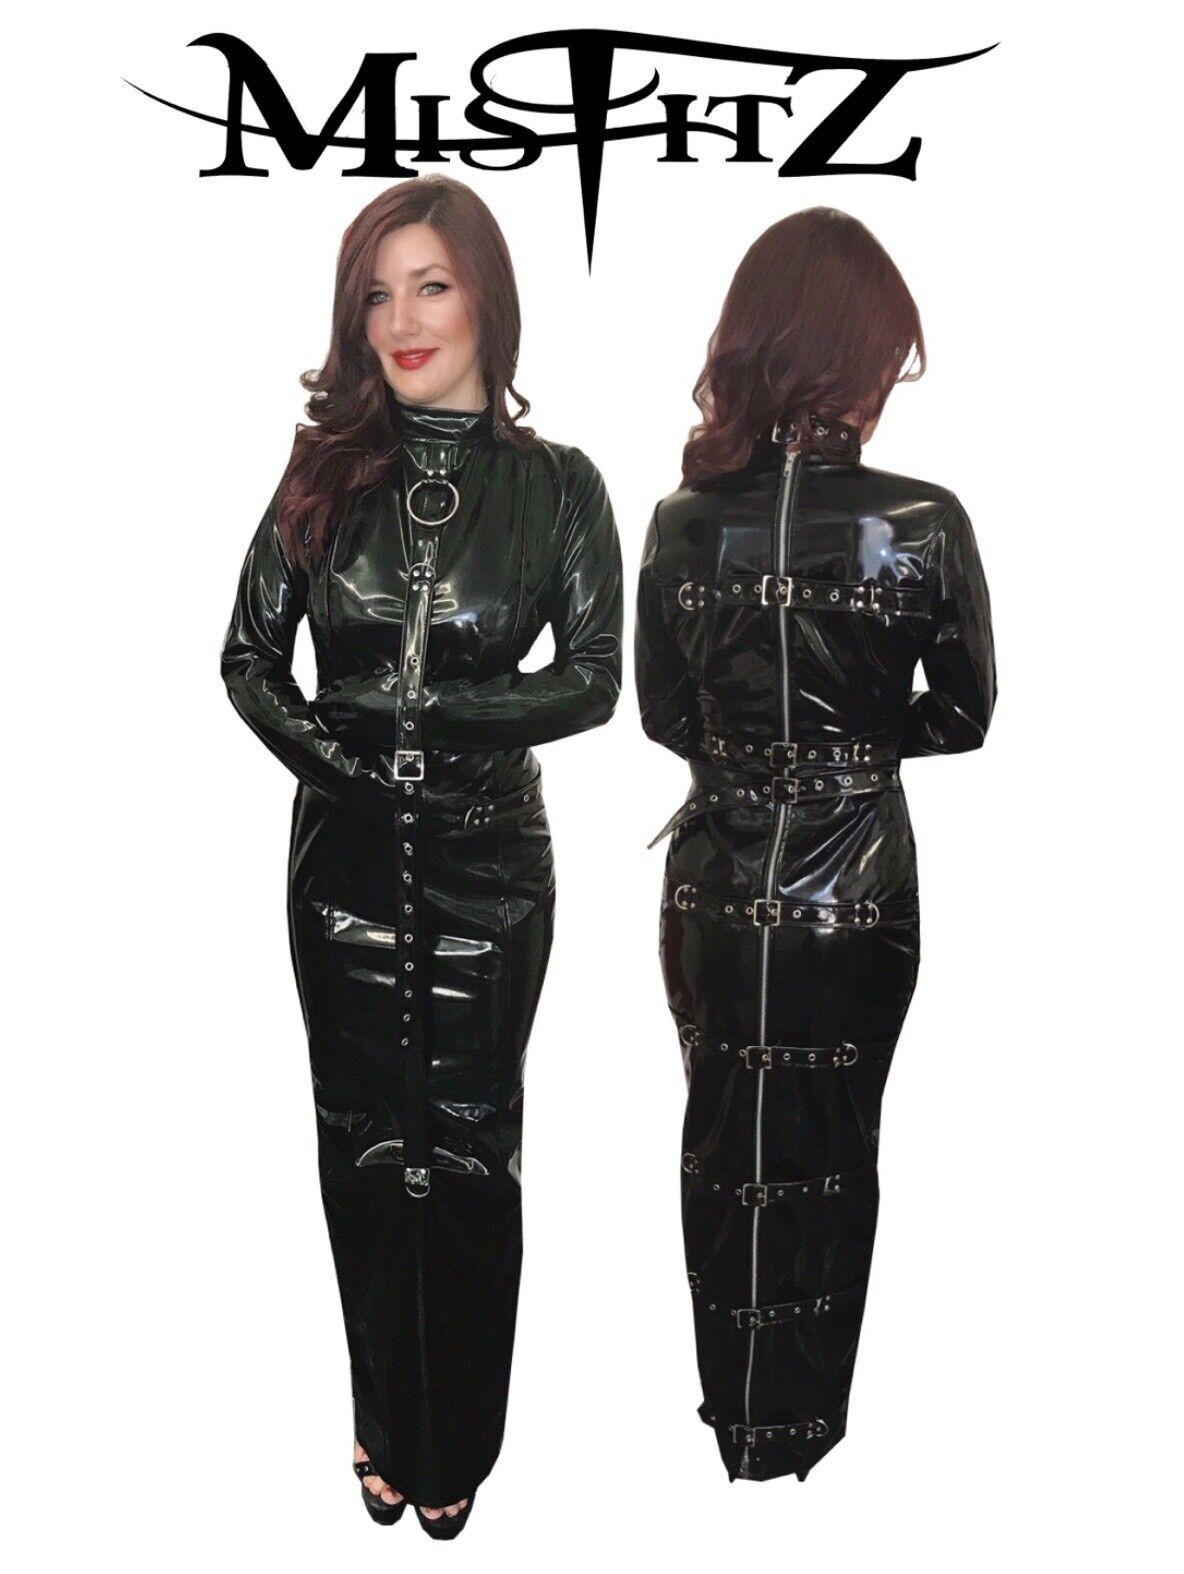 Misfitz NERA IN PVC PASTOIA Fibbia ritenuta Dress 8-32 MADE TO MEASURE TV CD Goth